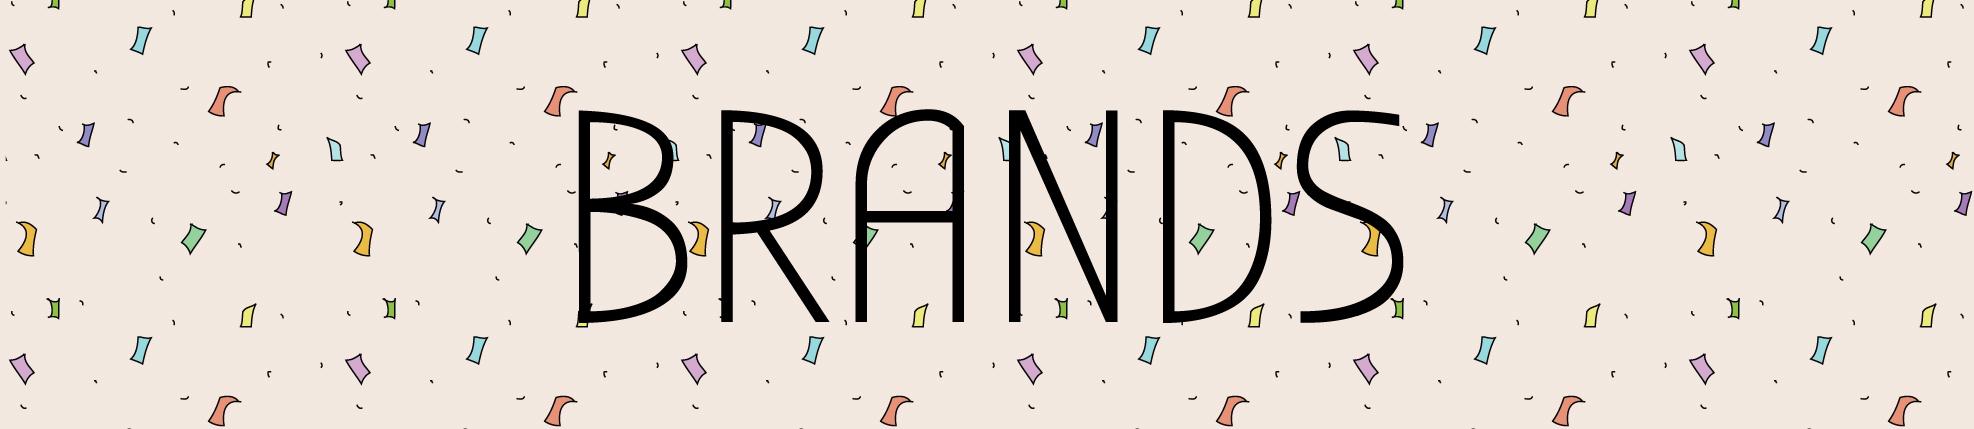 brands-ss20-banner.jpg